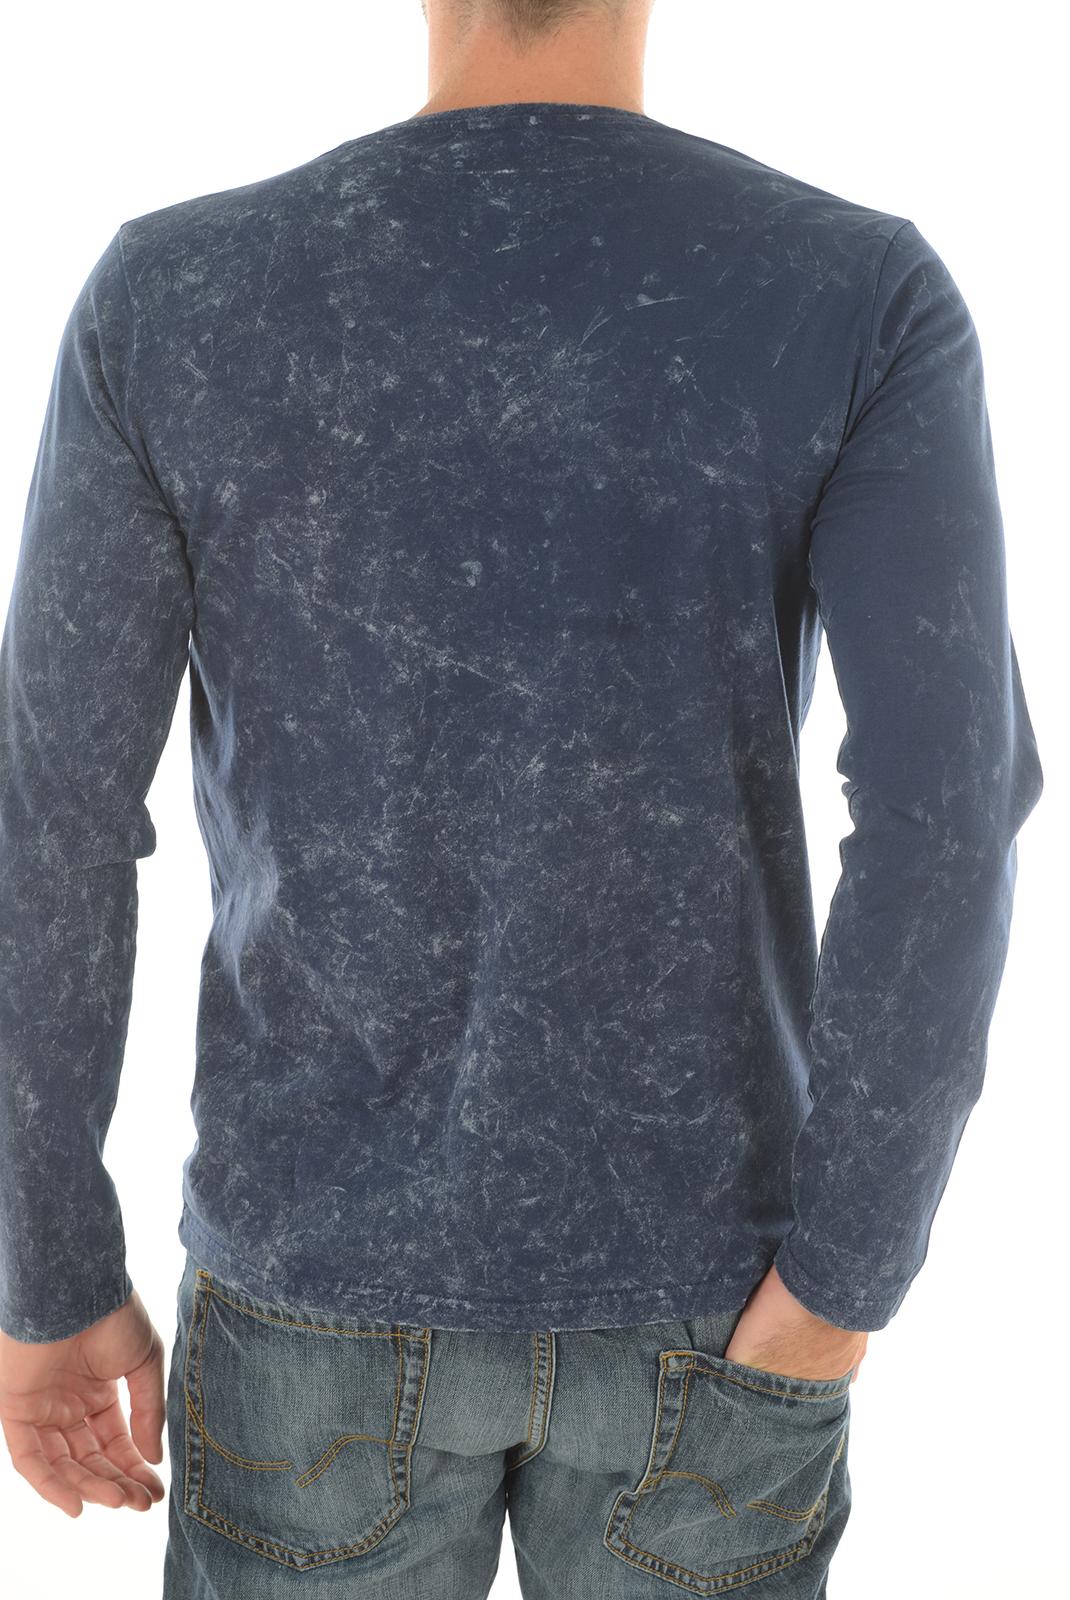 Tee-shirts  Biaggio jeans LOLA INDIGO